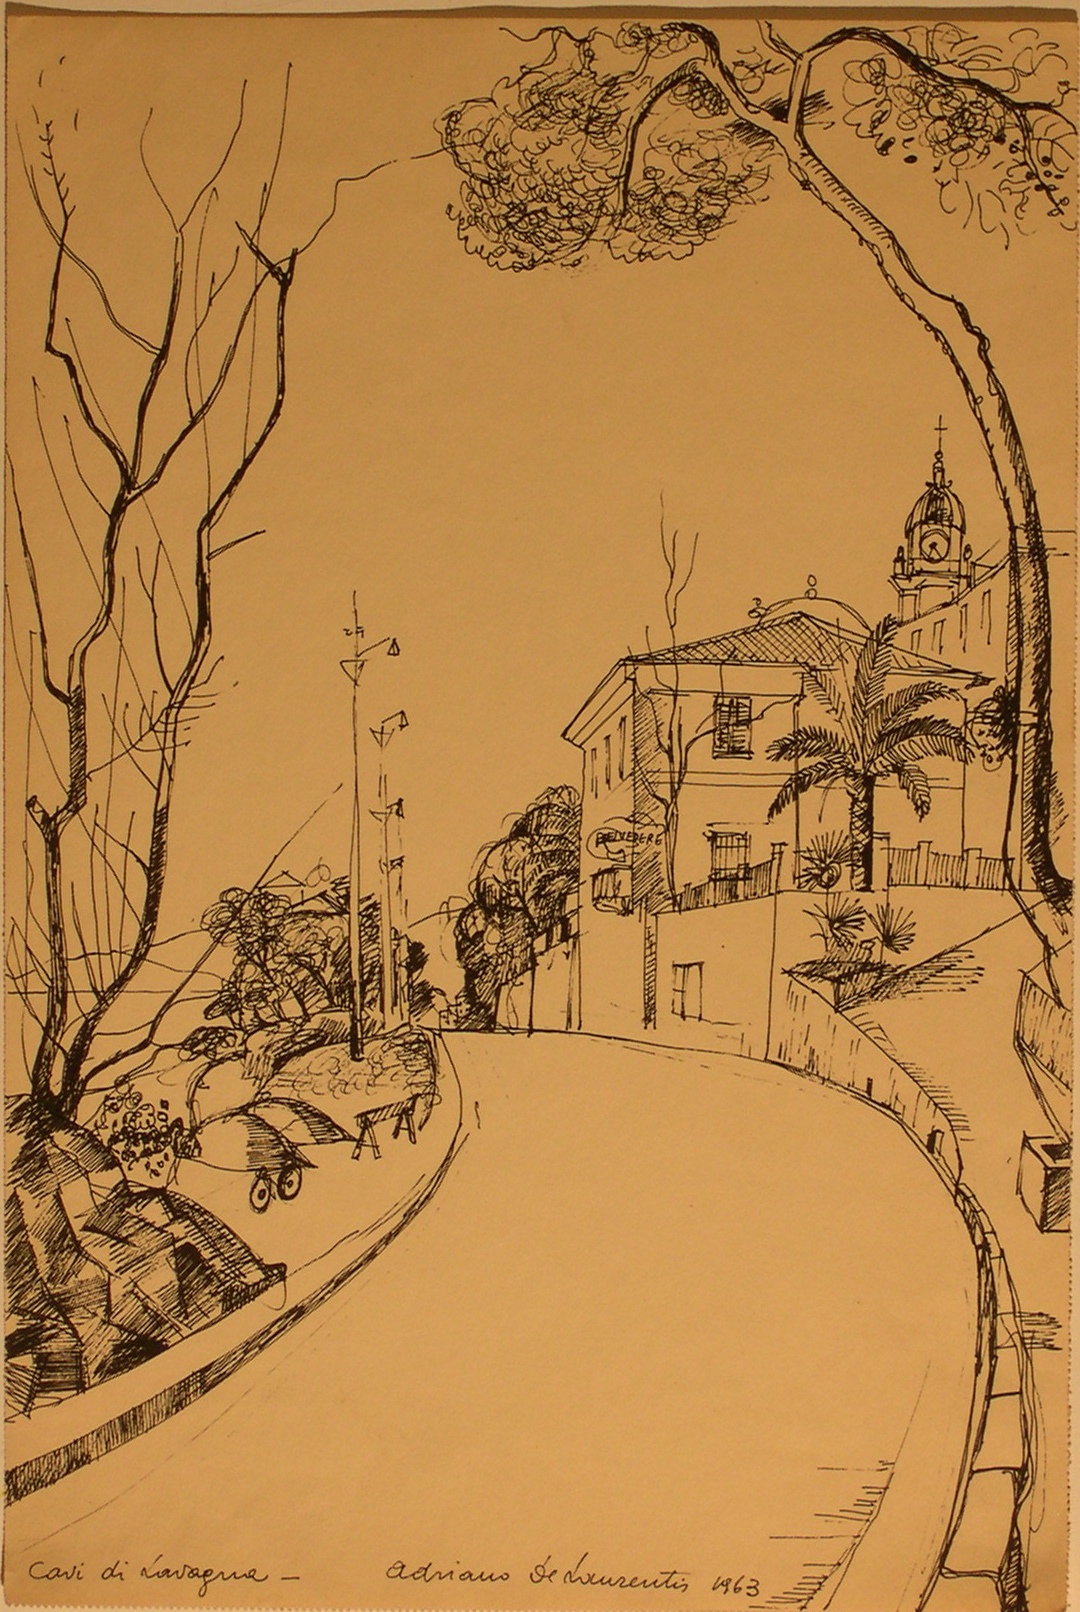 Cavi di Lavagna - Penna su Carta - 41x28 - 1963